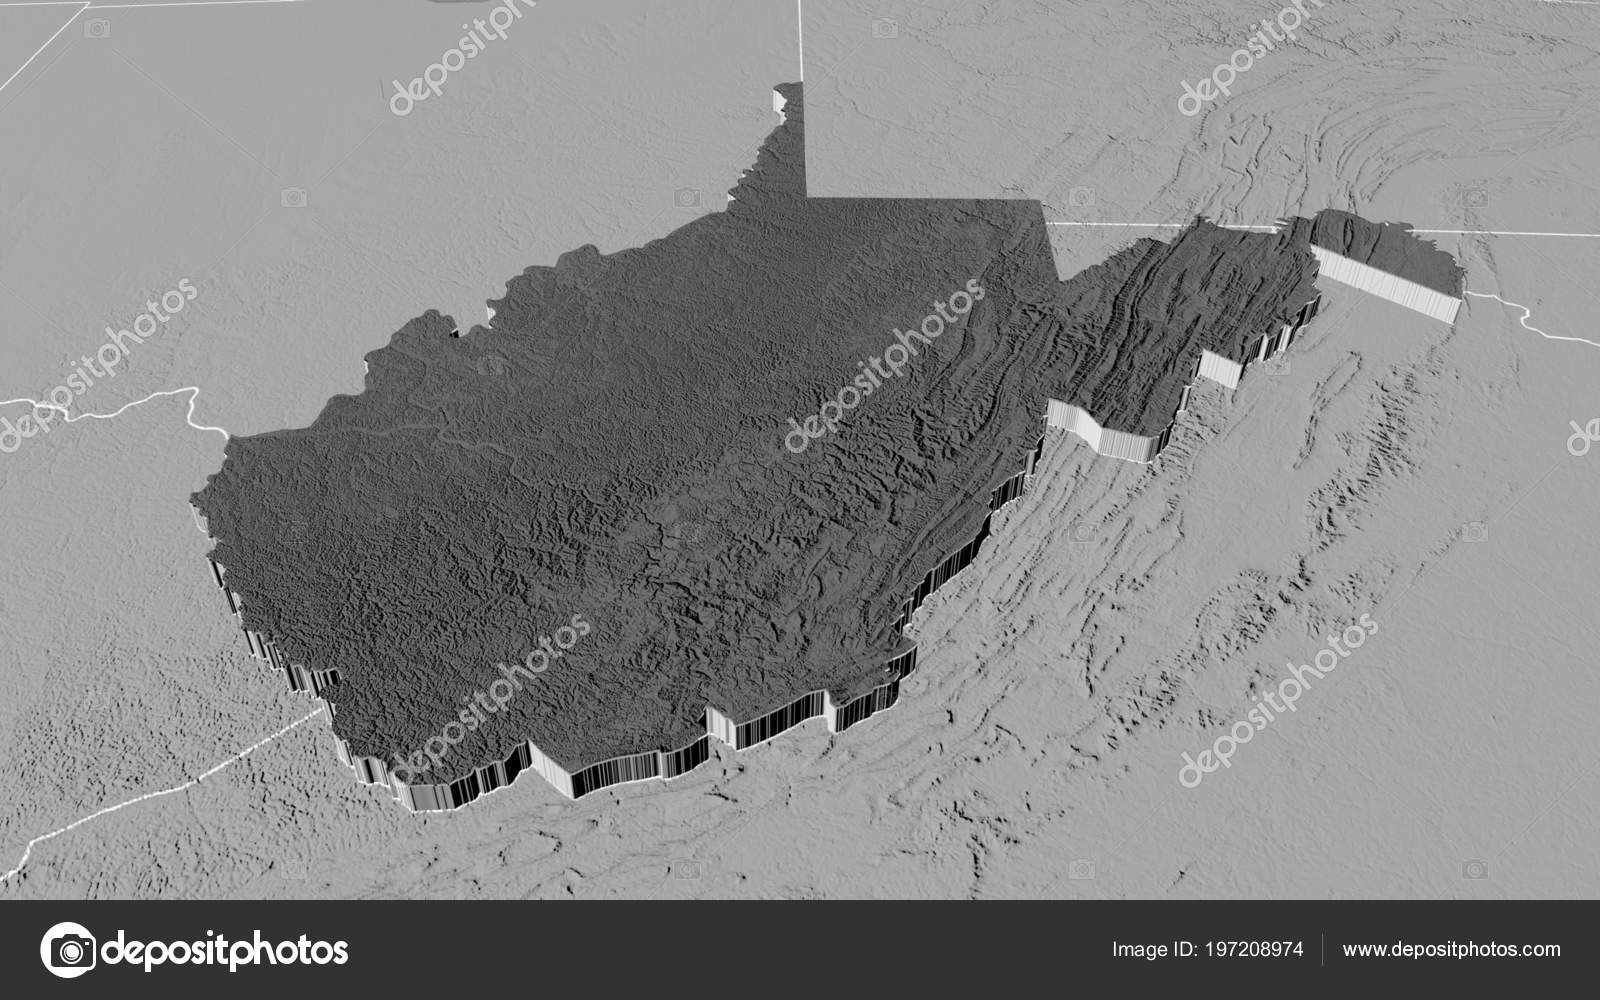 West Virginia Region United States Extruded Bilevel Elevation Map